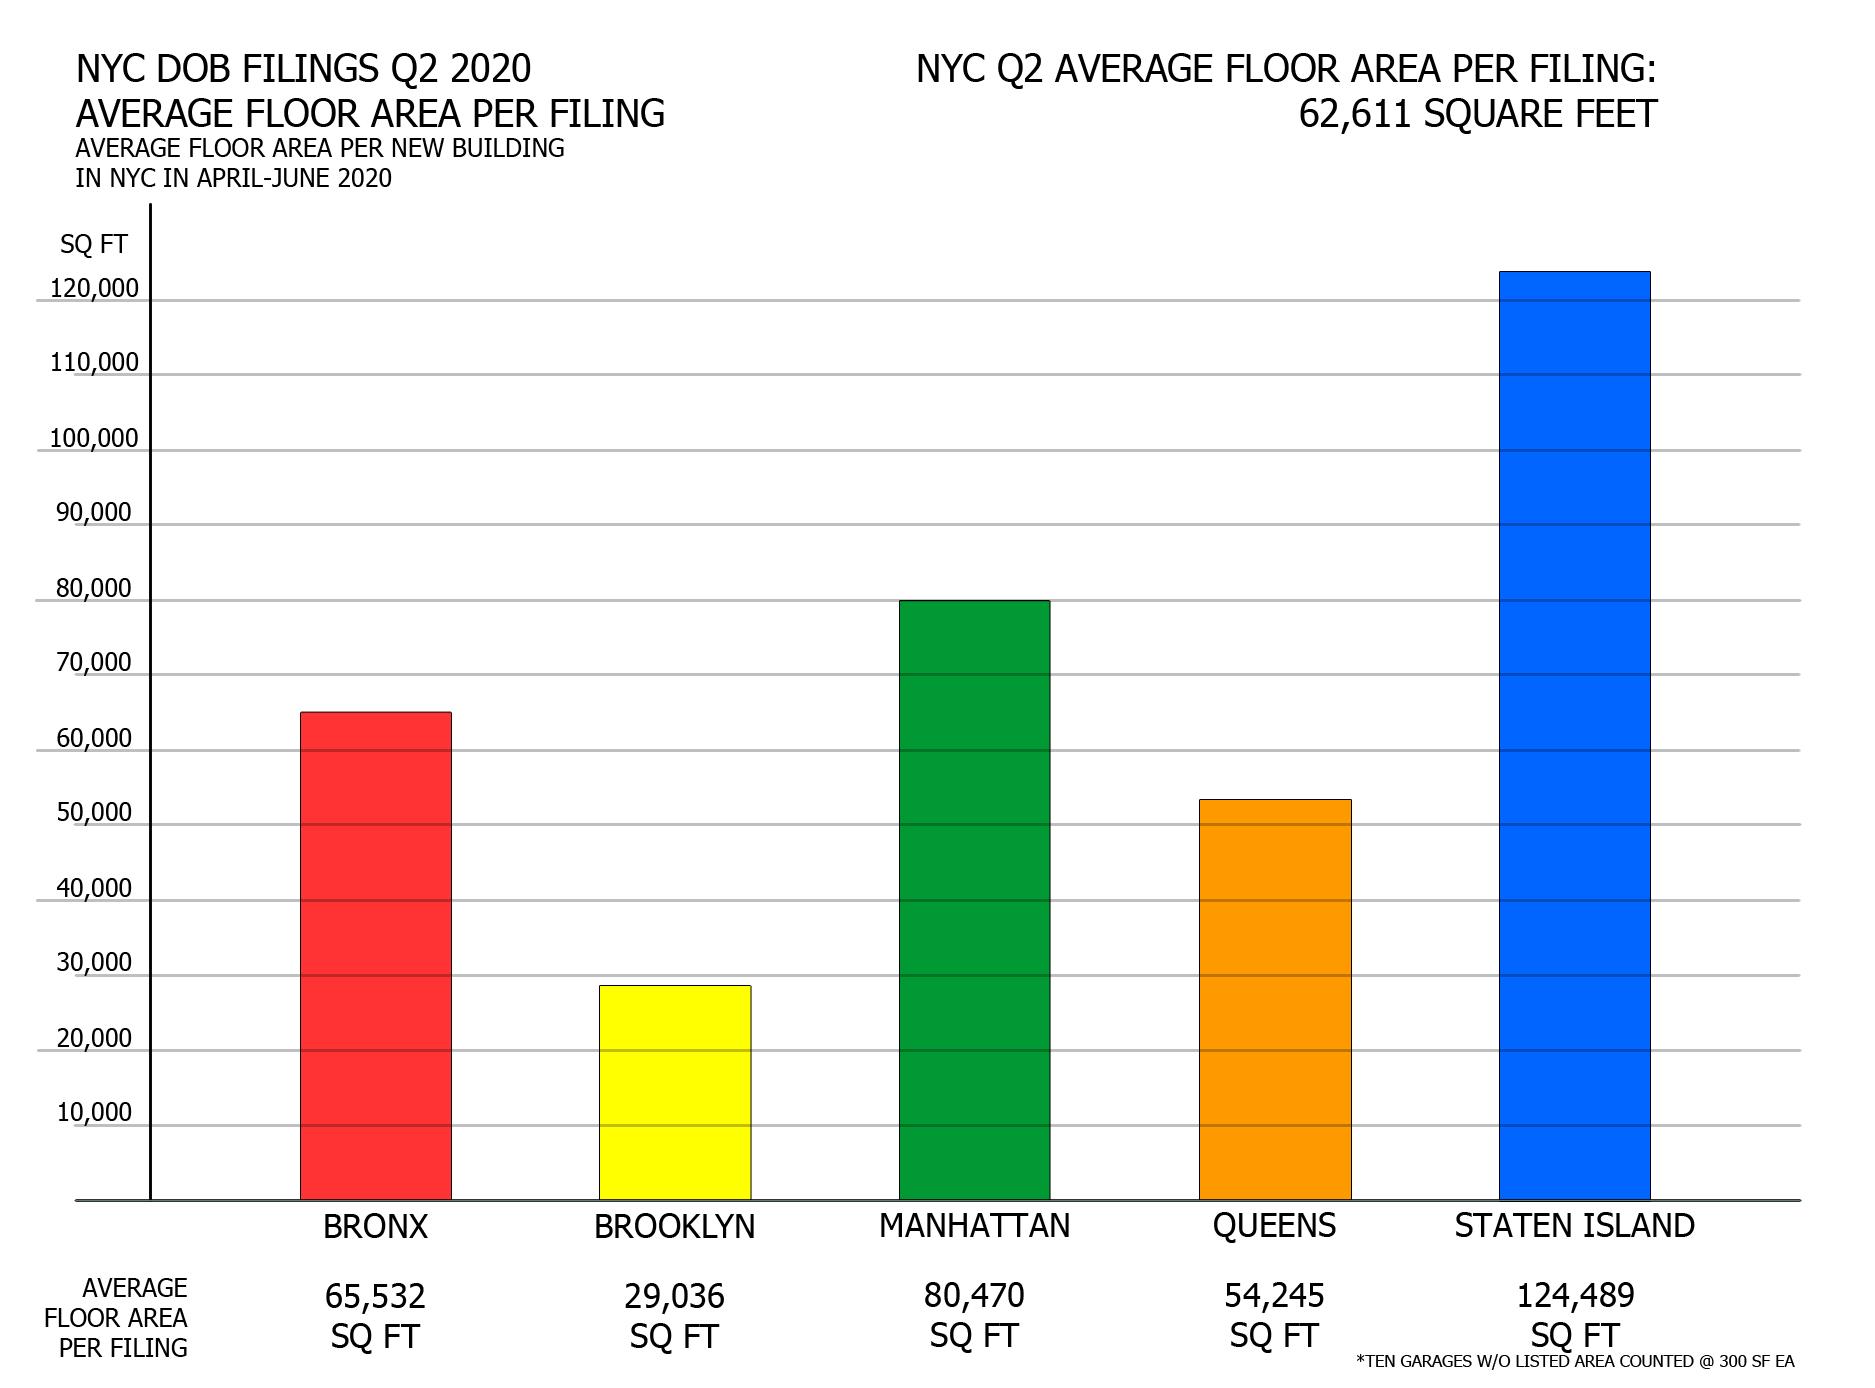 NYC Q2 2020 filings - Average floor area per borough. Image credit: Vitali Ogorodnikov